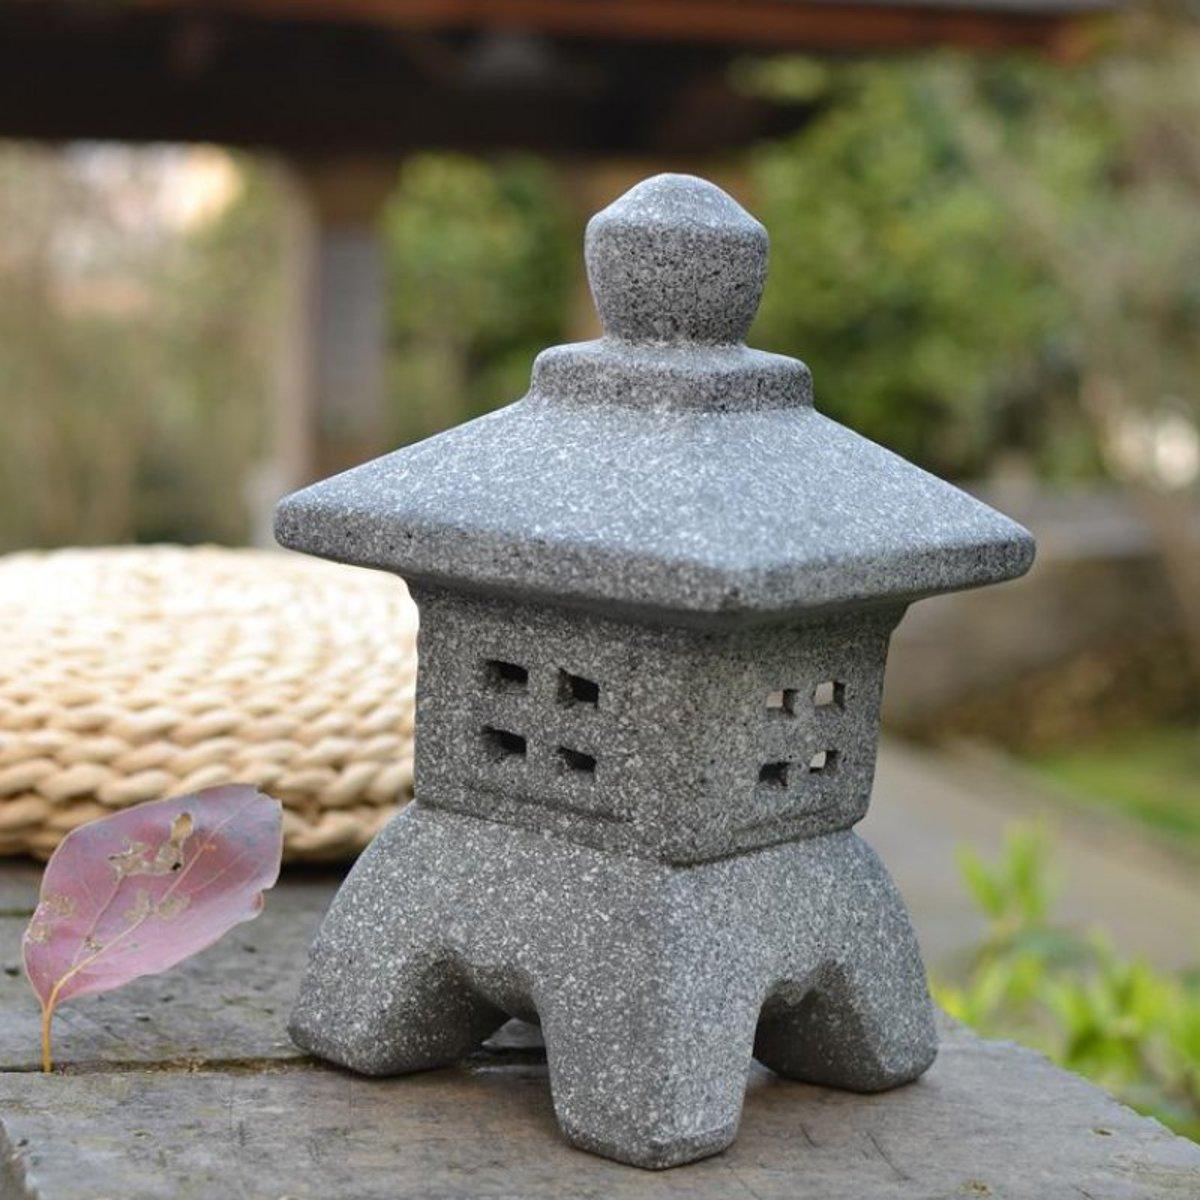 Japanese-style Ceramic Garden Ornament Pagoda Garden Yard Sculpture Lantern Crafts Candle Holder Patio Home Decoration Teahouse